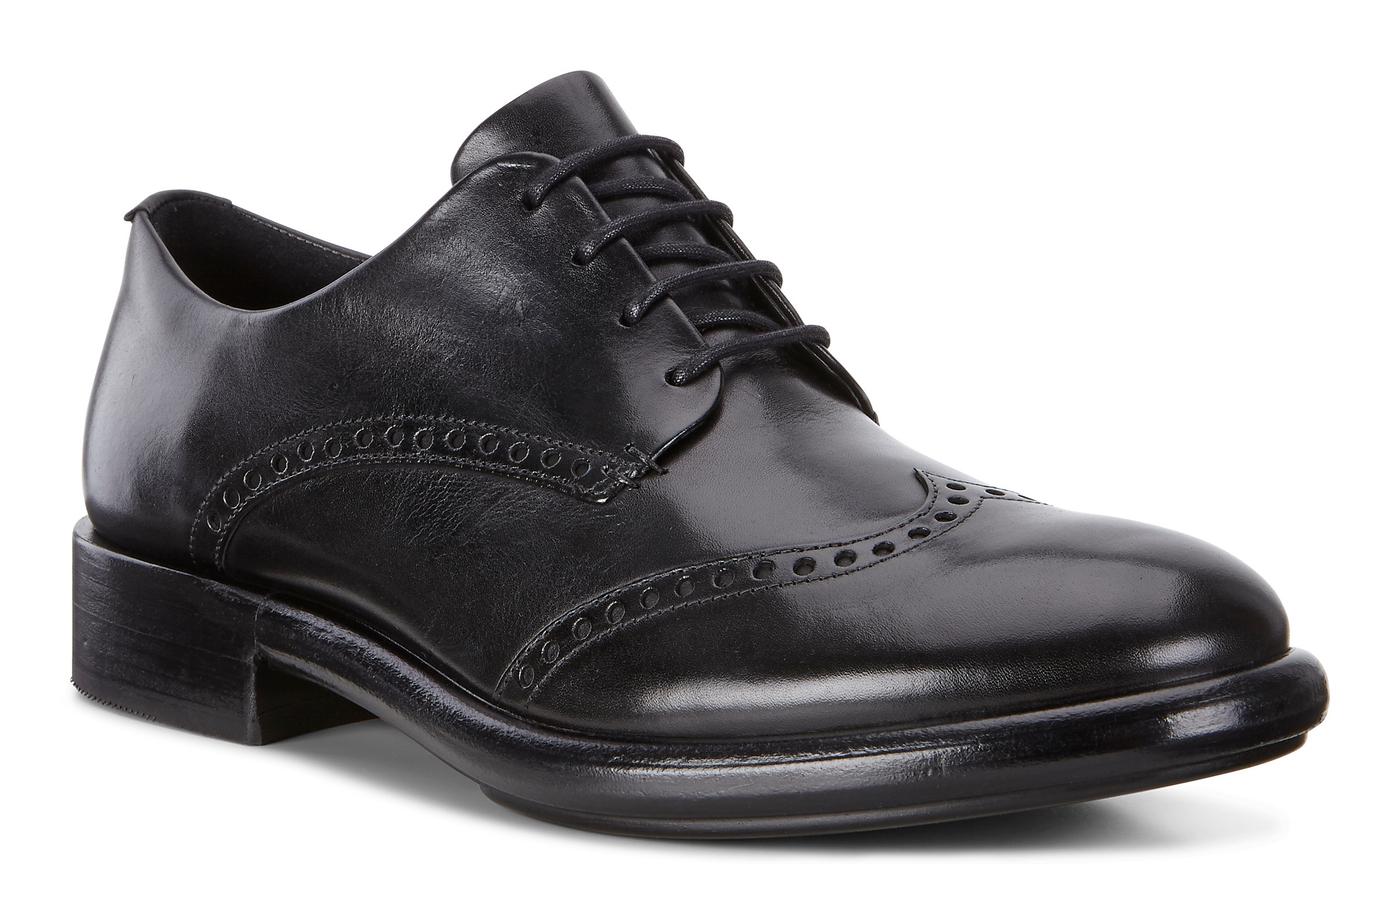 ECCO VITRUS ARTISAN Shoe